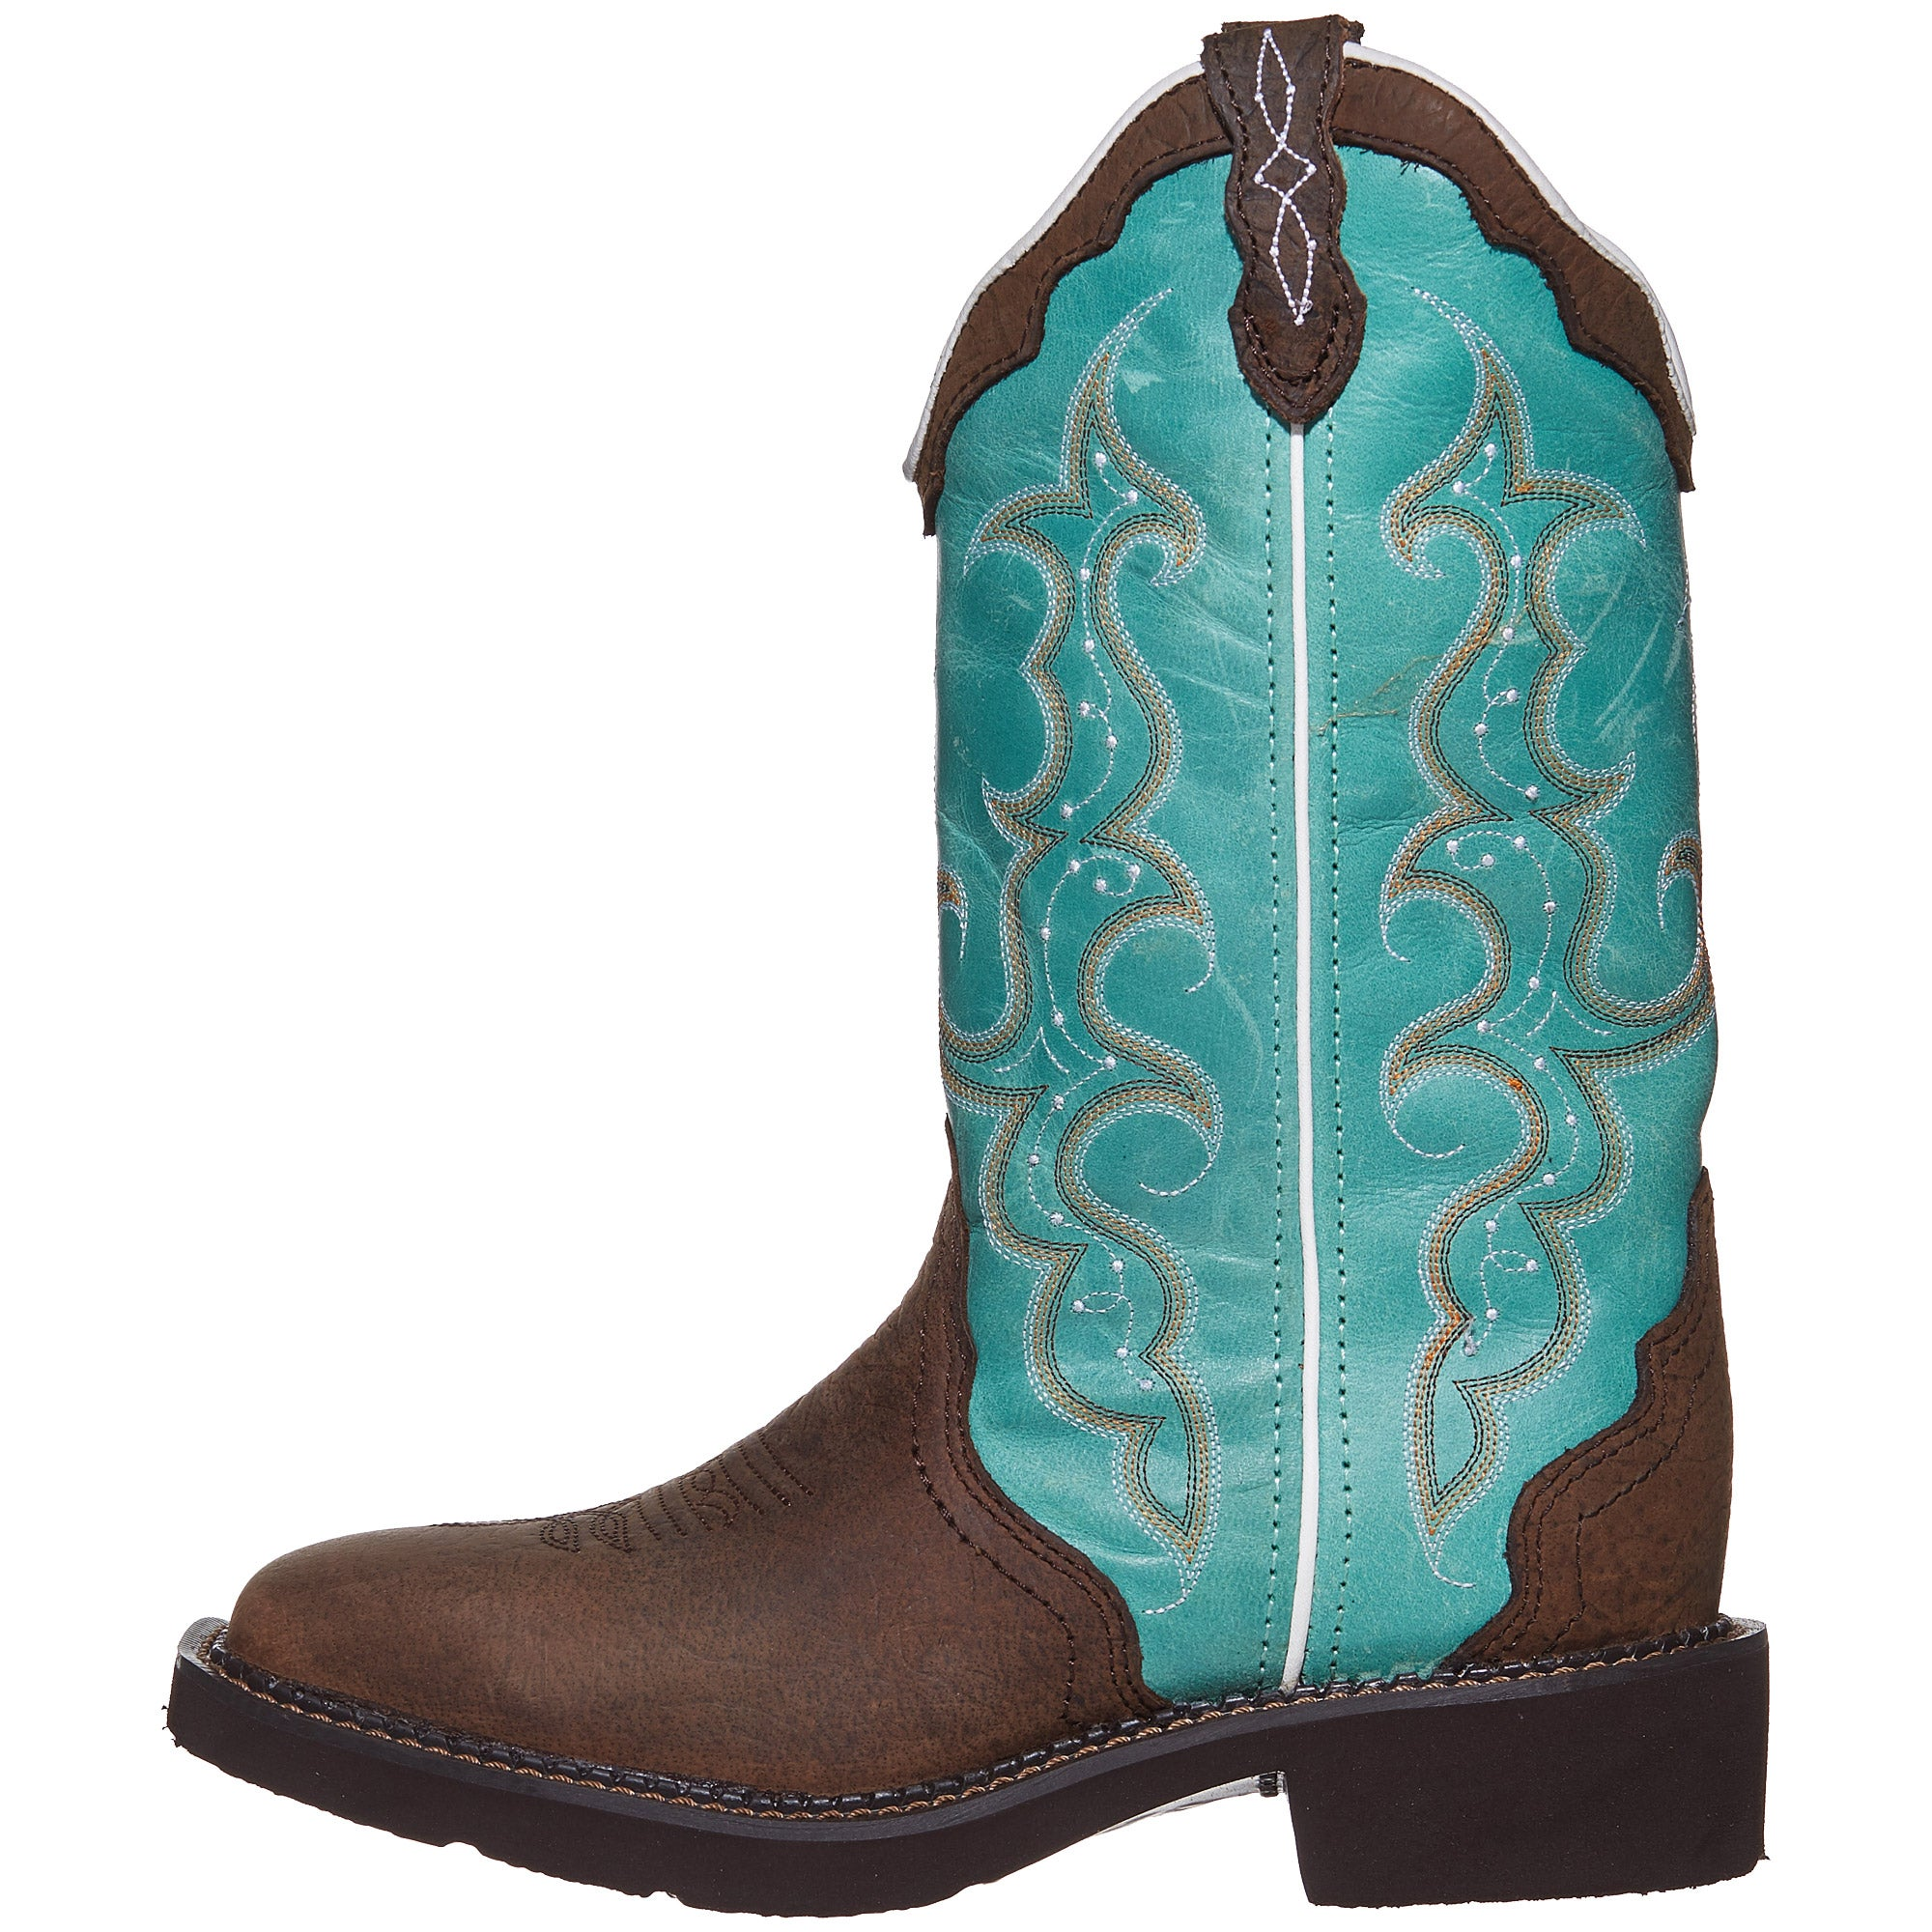 27b2d94935f Justin Gypsy Raya Turquoise Women's Cowboy Boots - Riding Warehouse